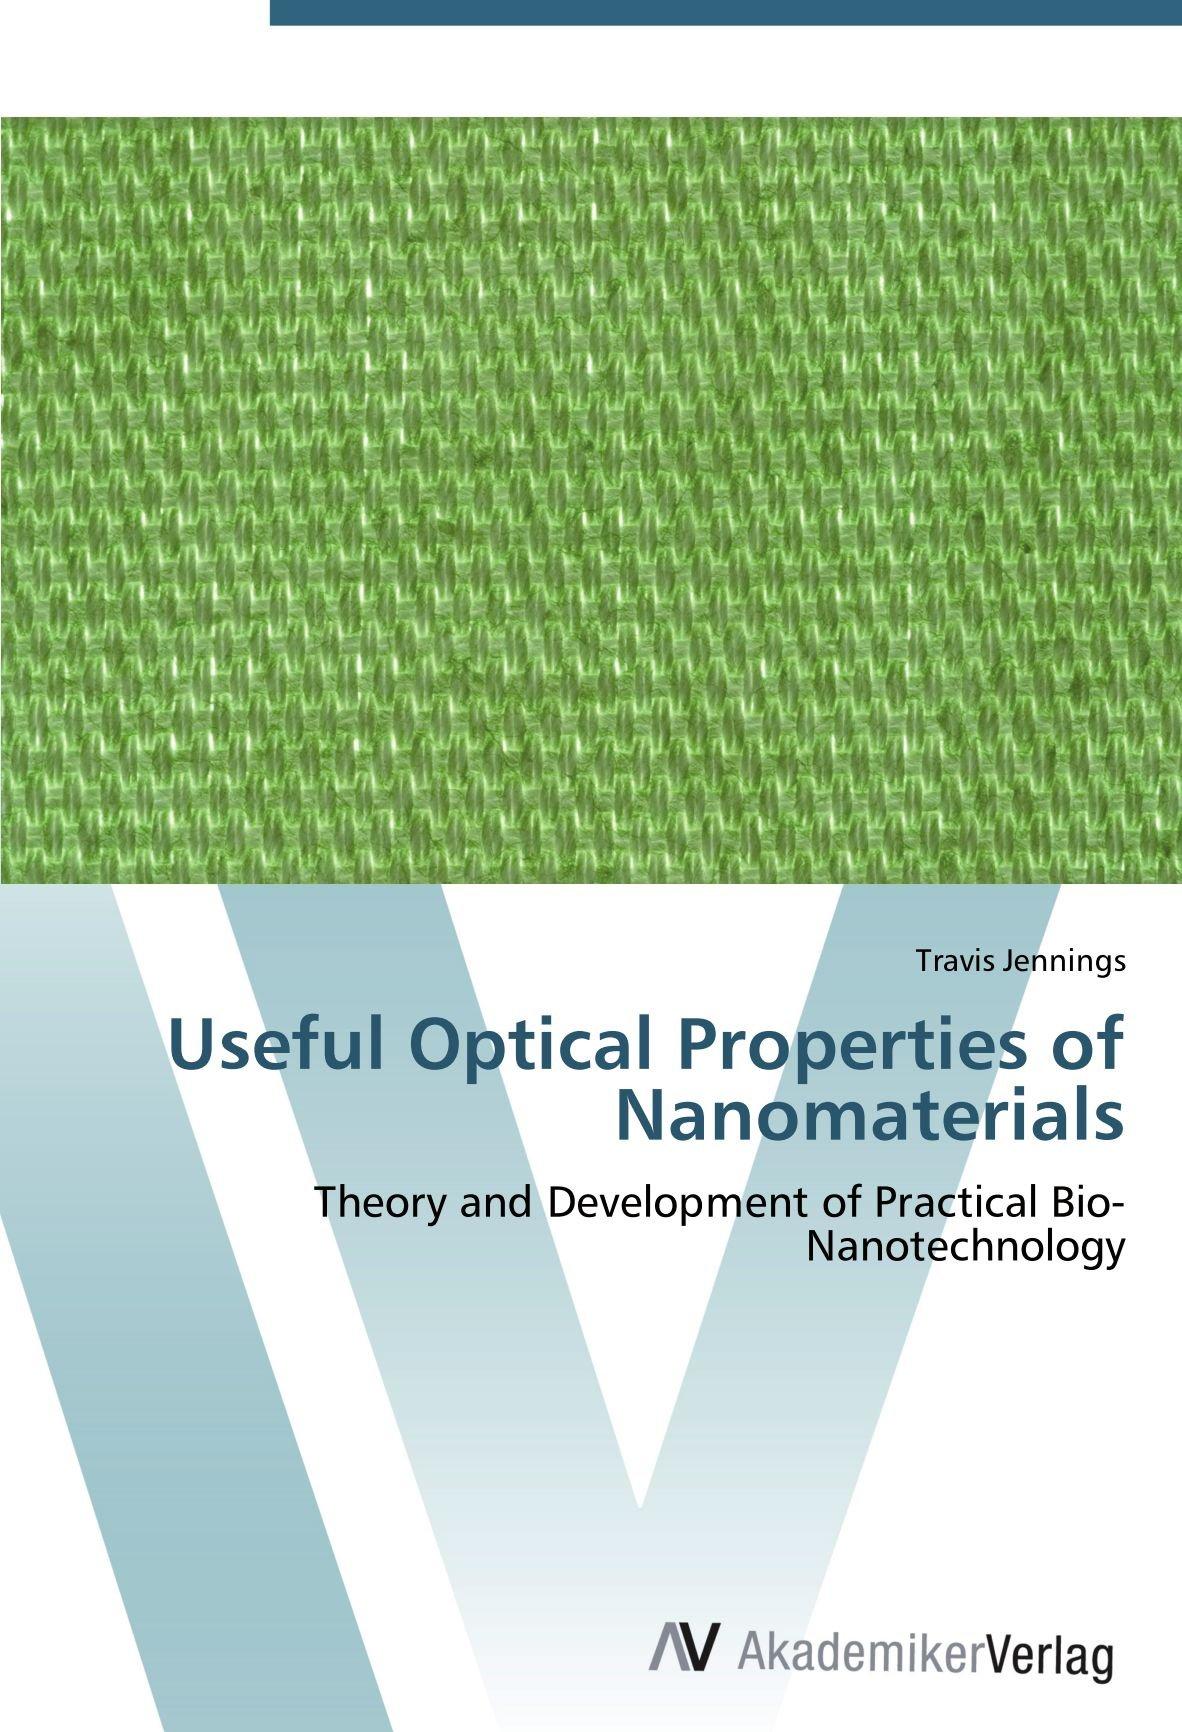 Useful Optical Properties of Nanomaterials: Theory and Development of Practical Bio-Nanotechnology ebook